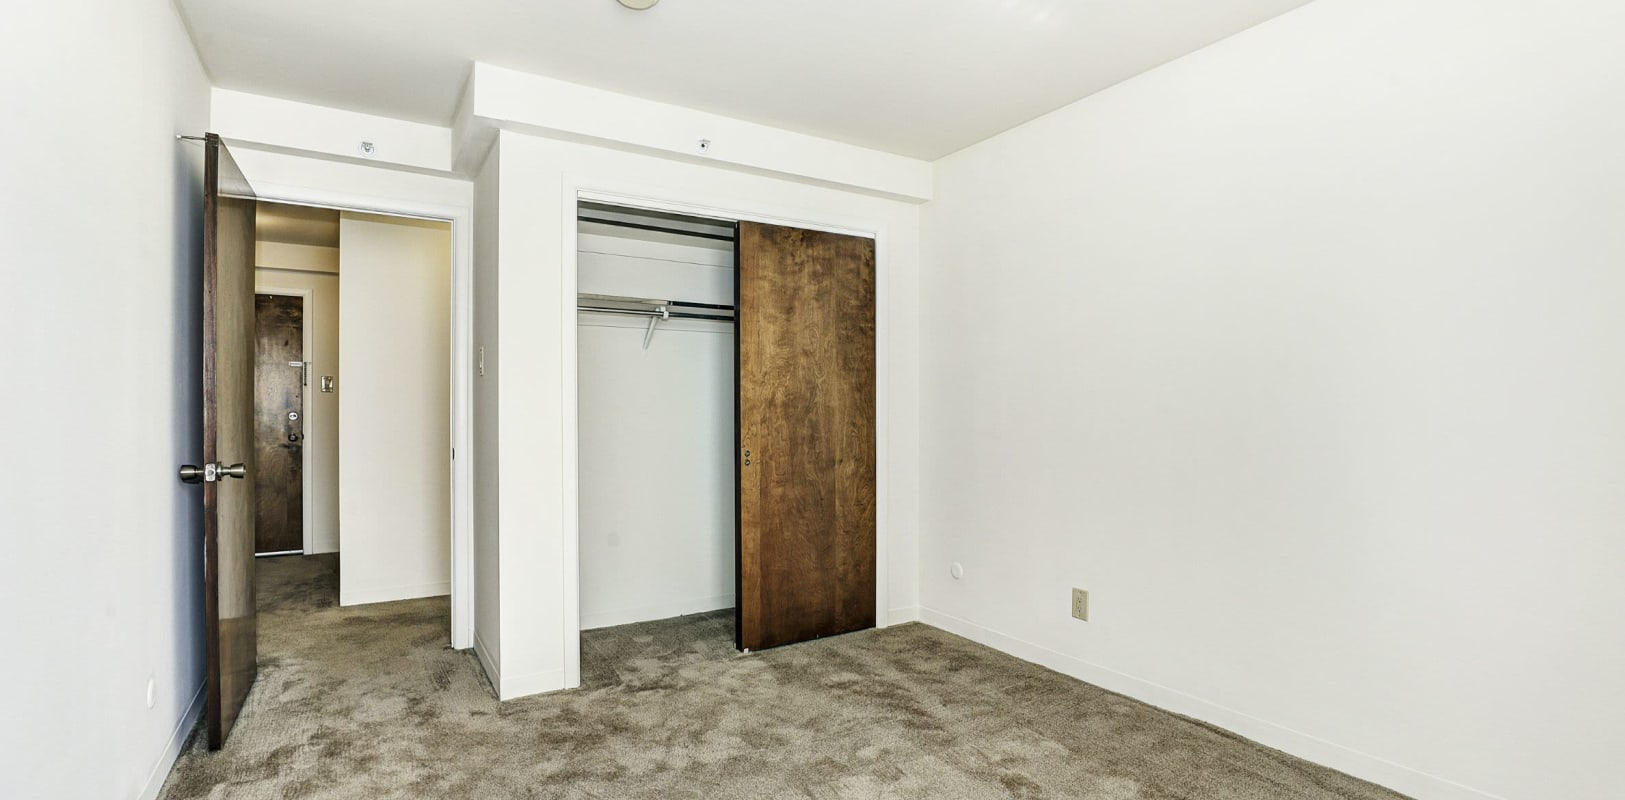 Bedroom with a walk-in closet at Bethlehem Towers in Bethlehem, Pennsylvania